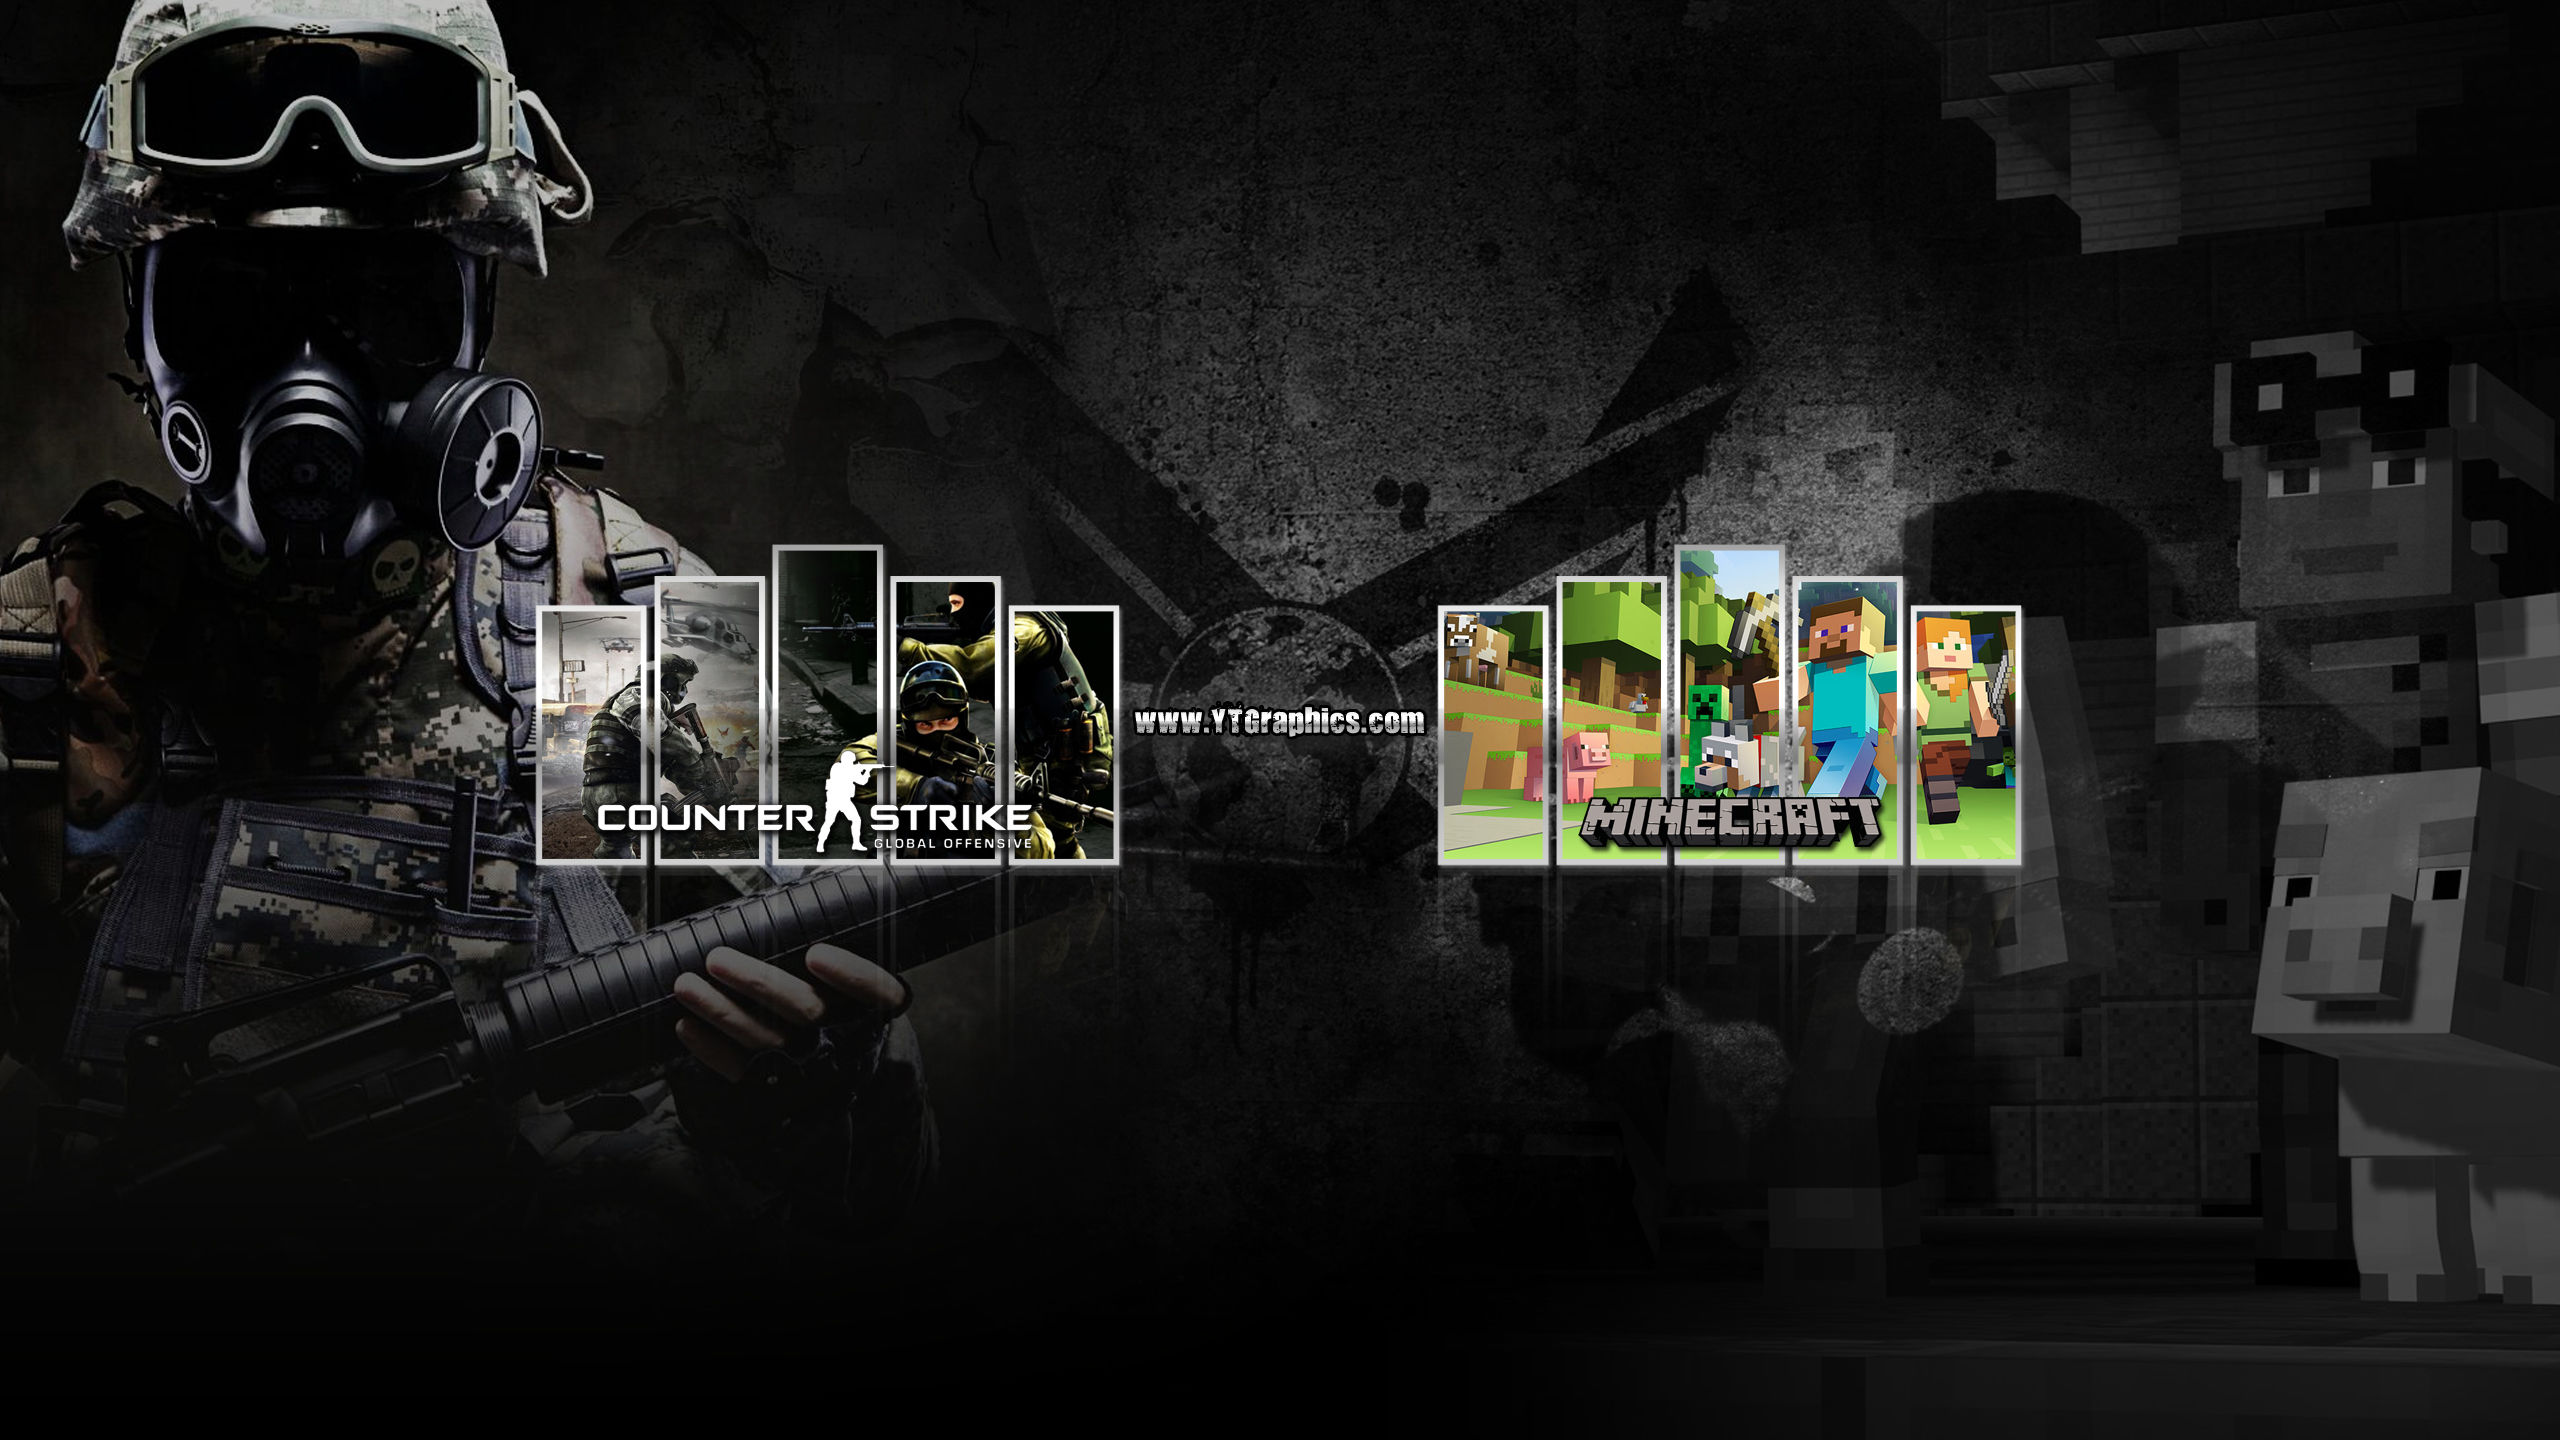 Mix Csgo Minecraft Youtube Channel Art Banner